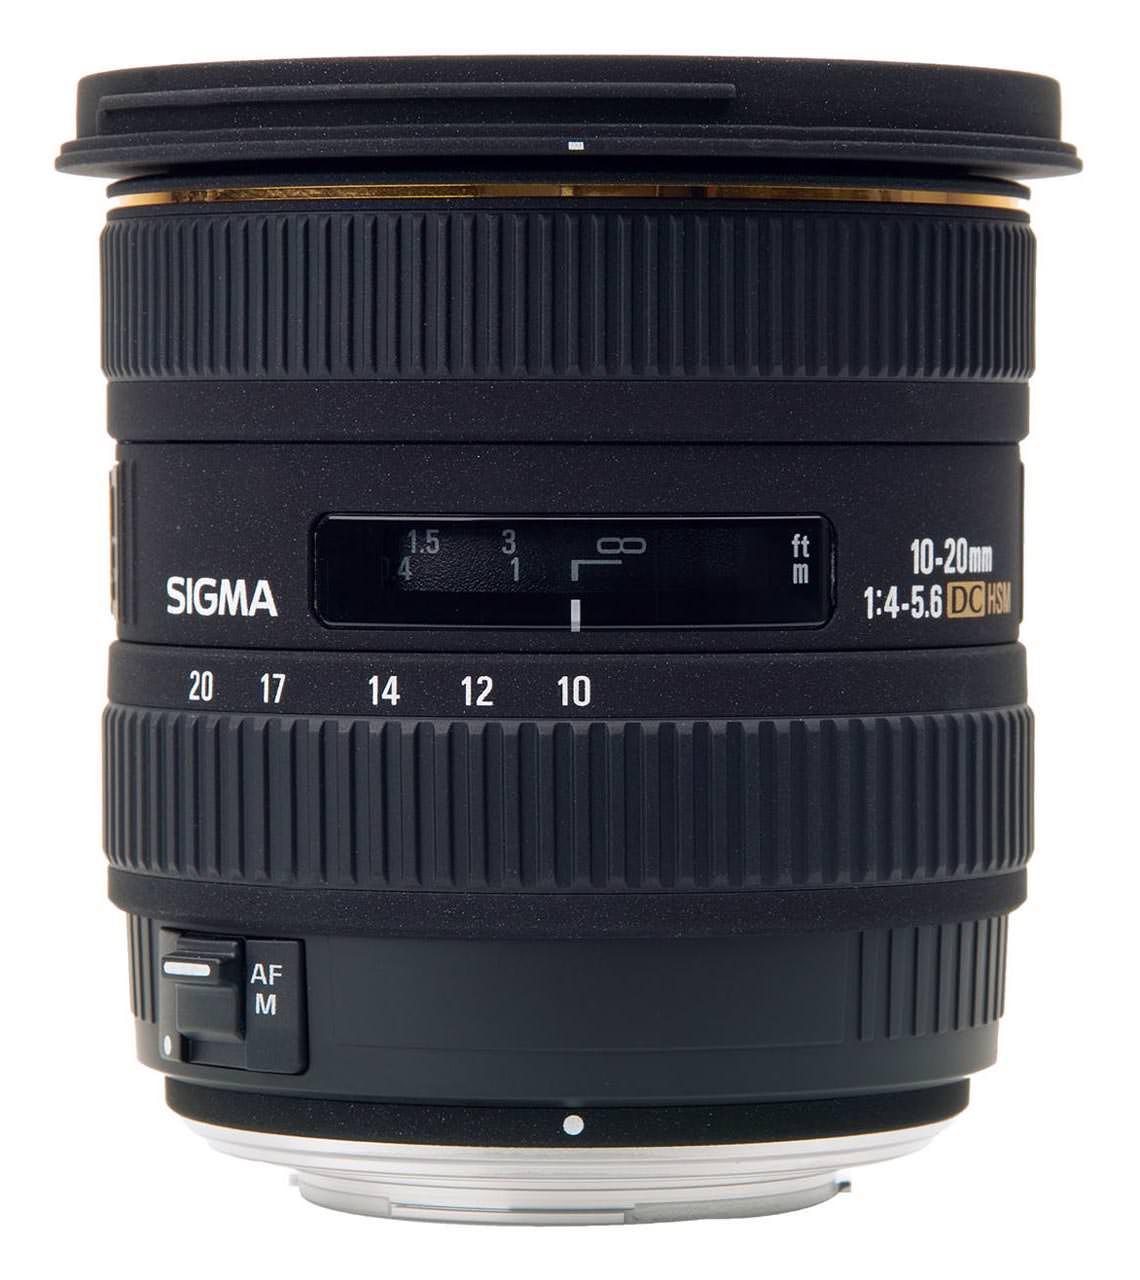 Sigma 10-20mm f/3.5 EX DC HSM Interchangeable Lens Review